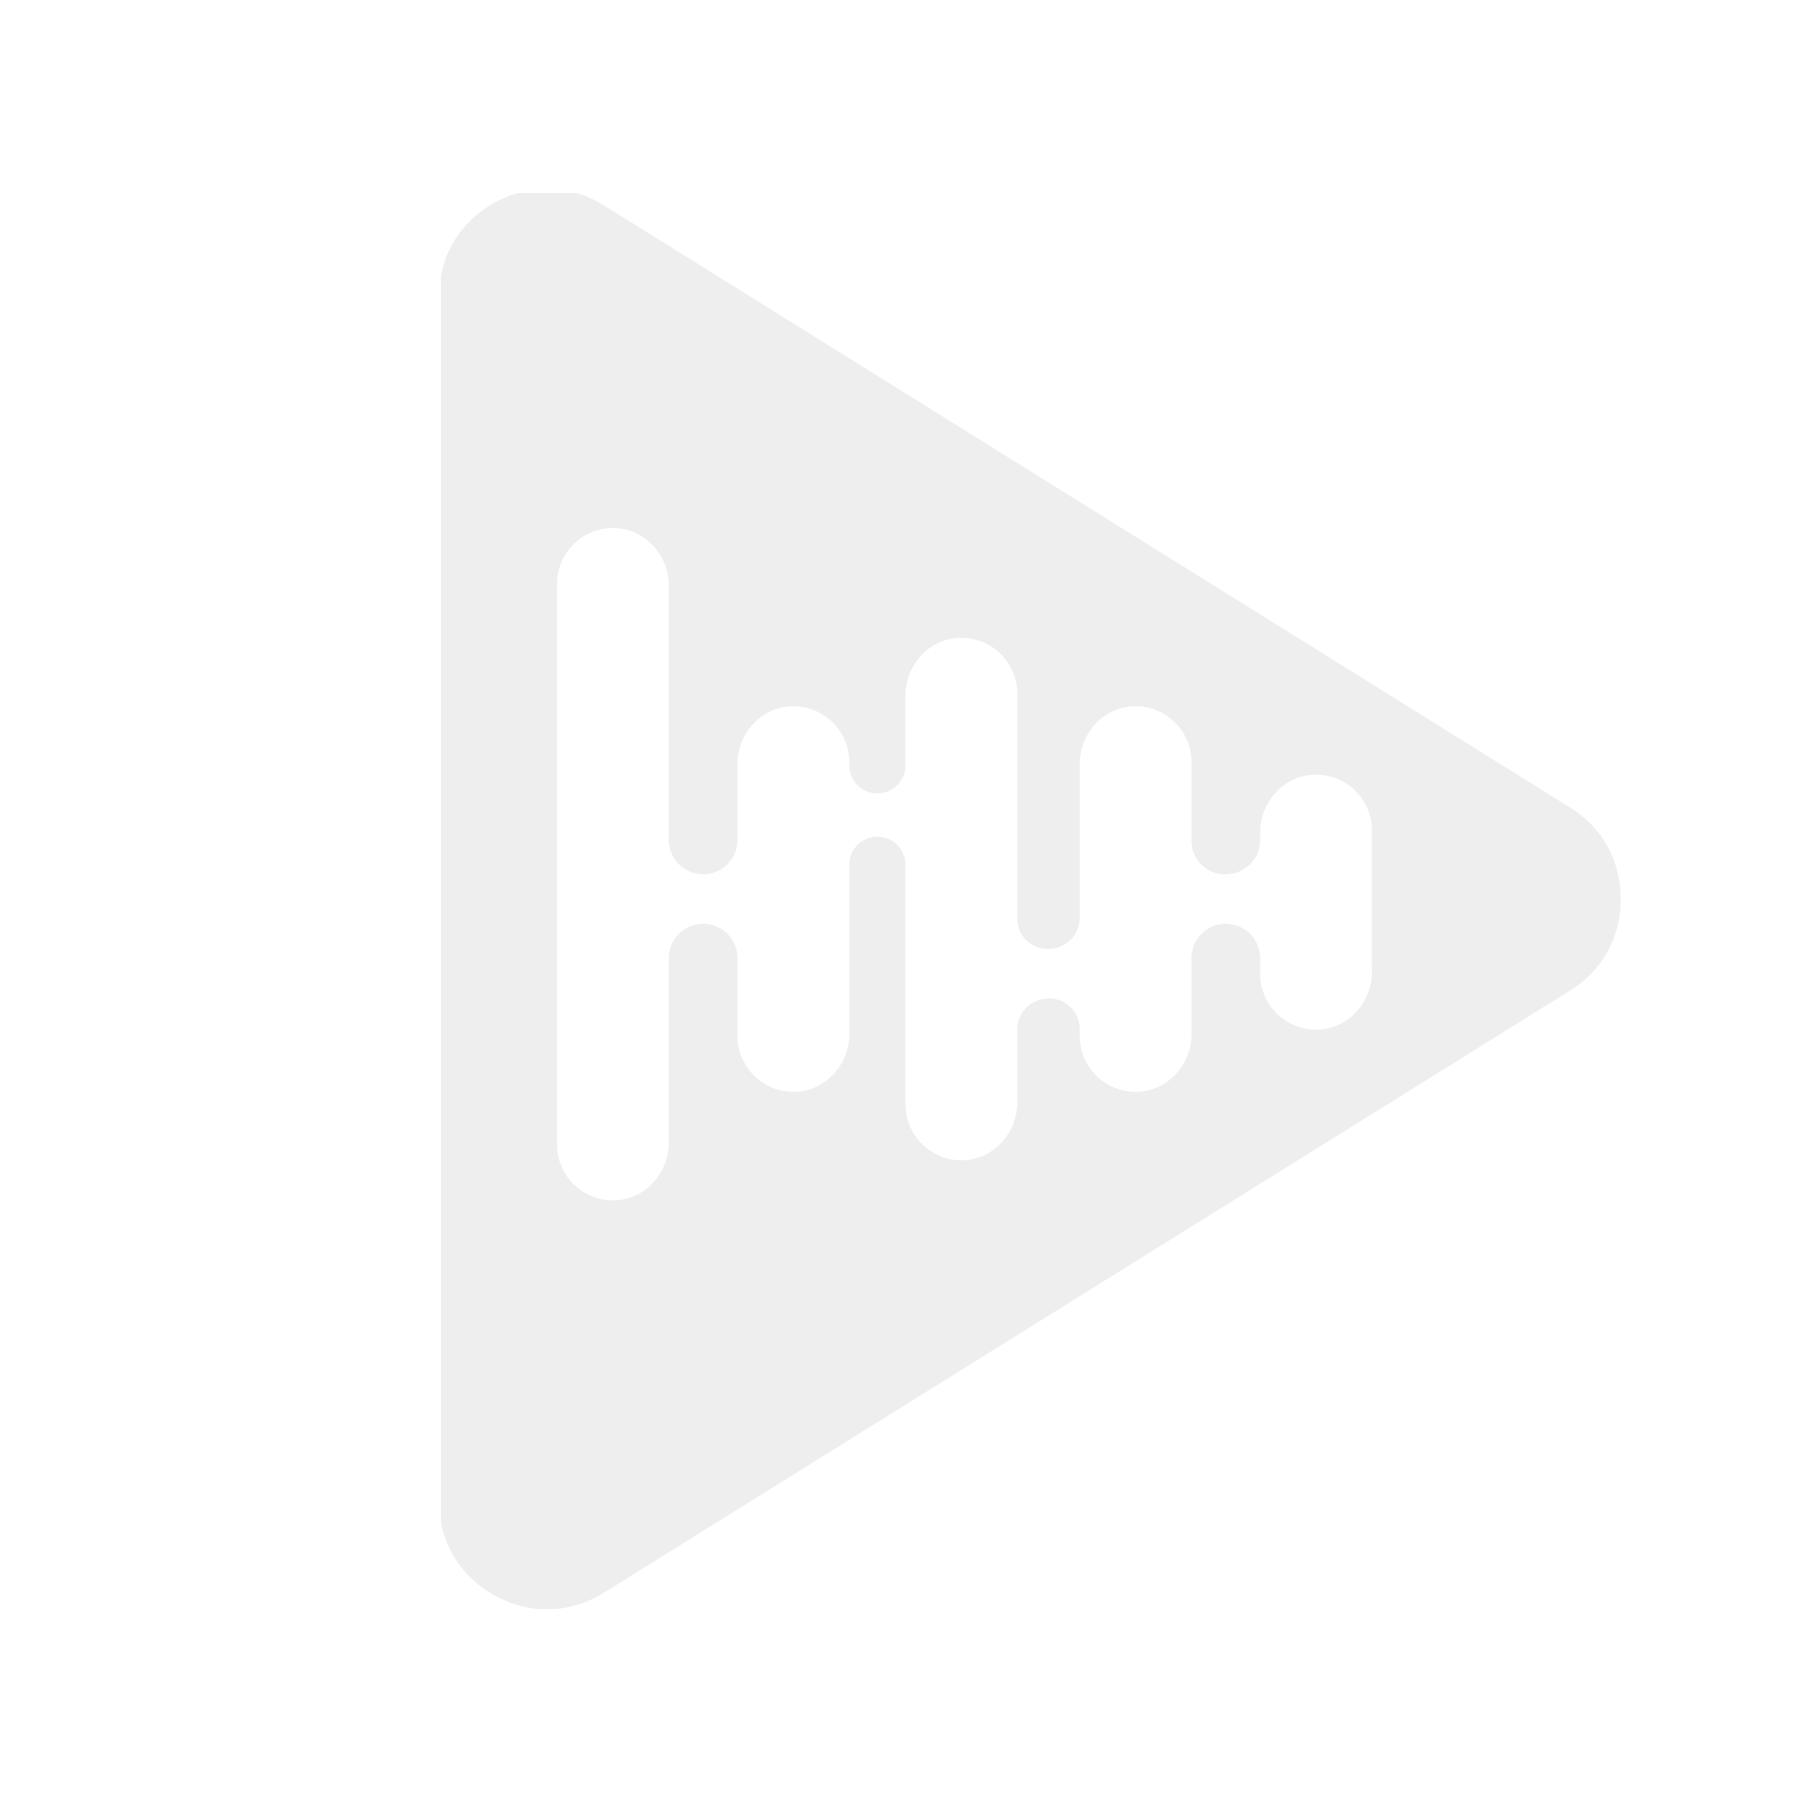 Skoddejuice Brandy Aroma